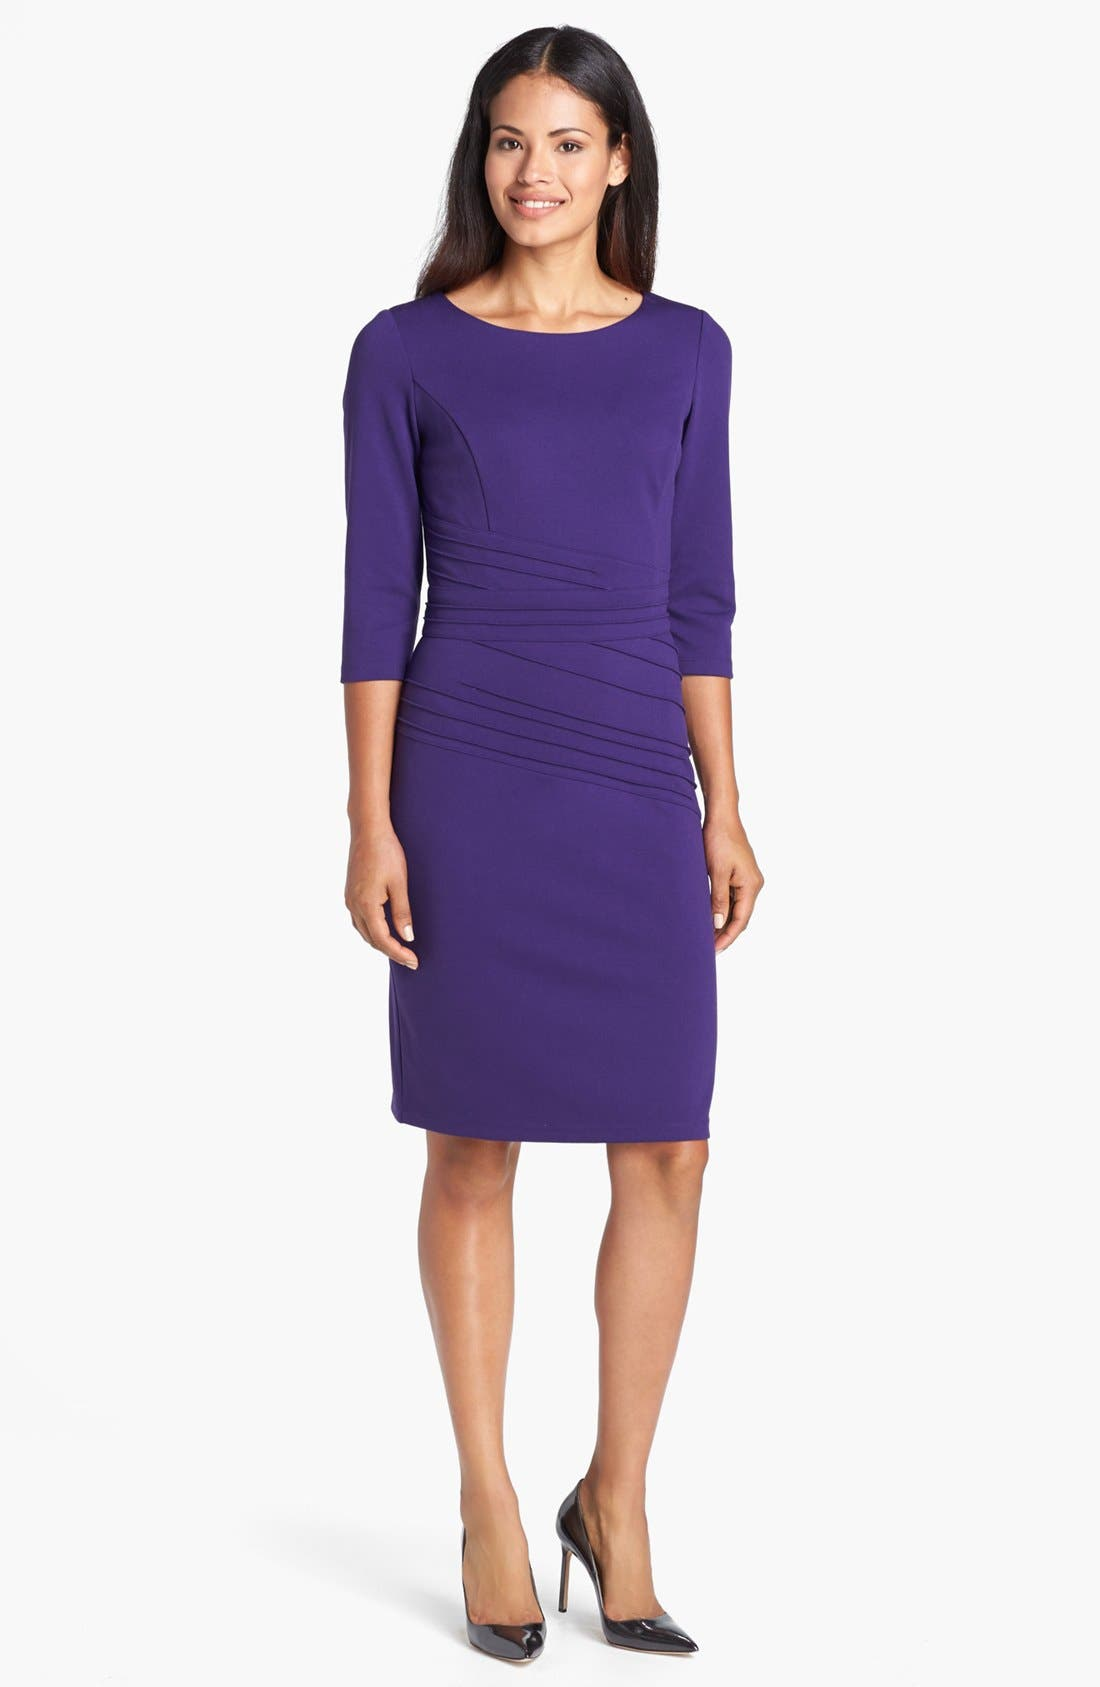 Alternate Image 1 Selected - Ellen Tracy Seamed Ponte Knit Sheath Dress